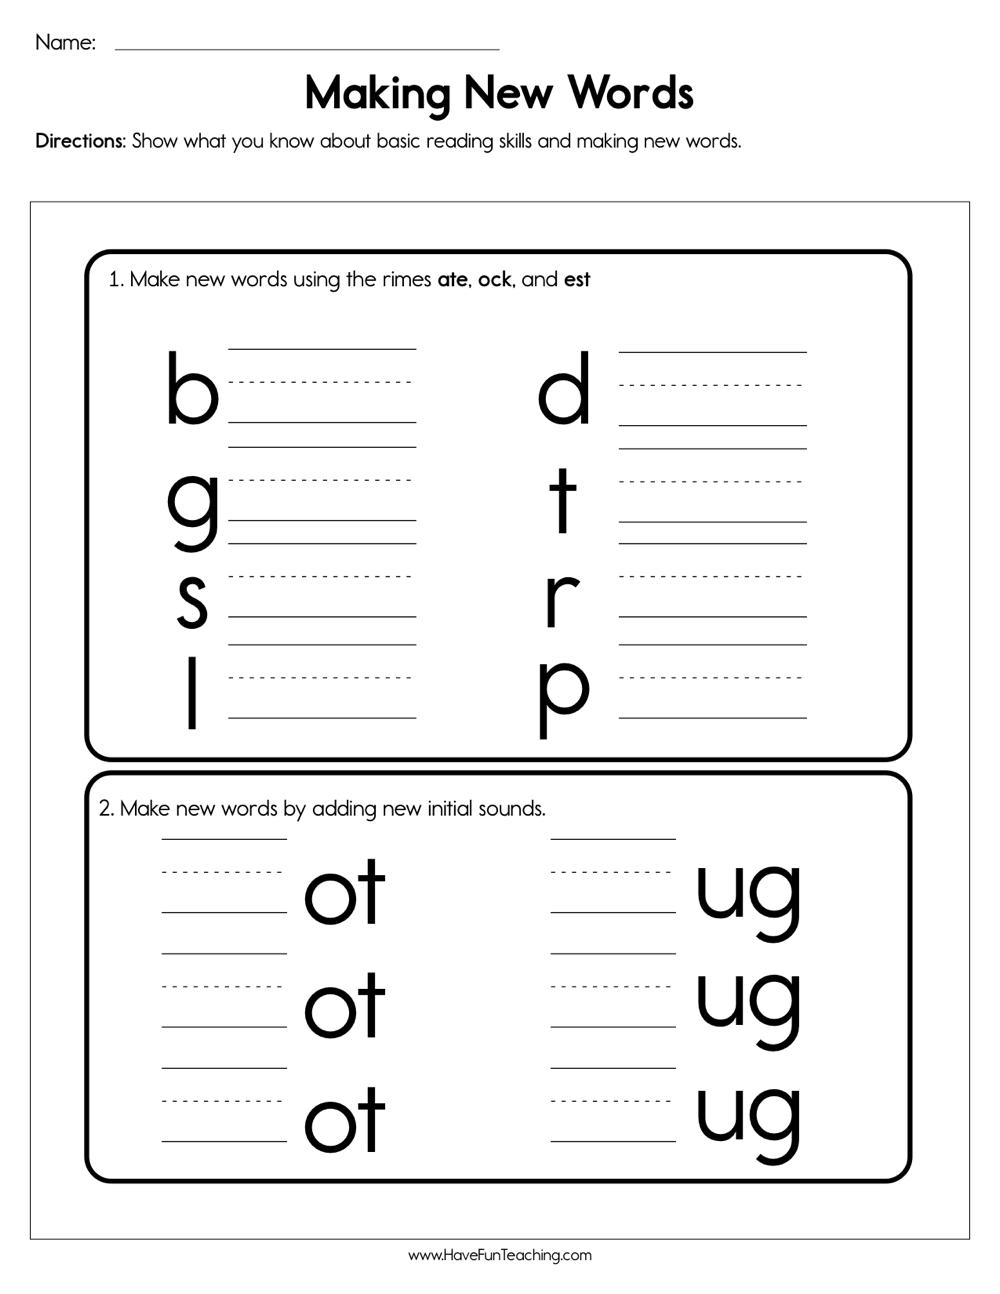 Making New Words Worksheet